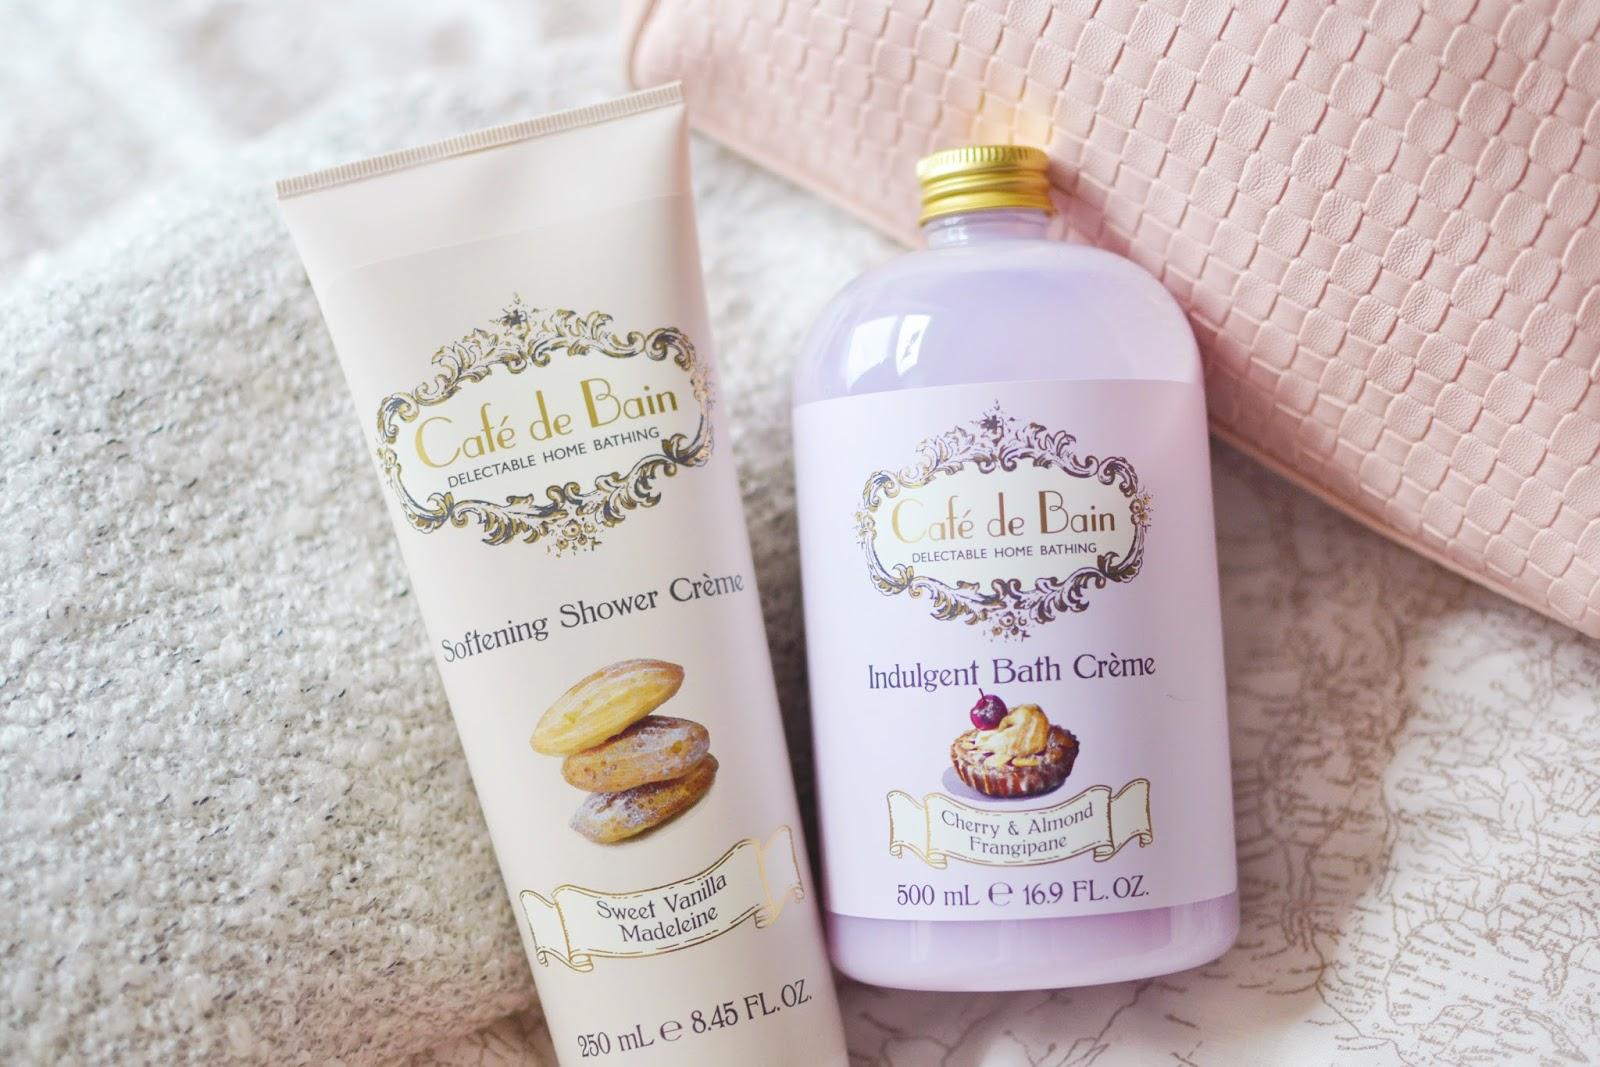 affordable bath products, cafe de bain, cafe de bain products